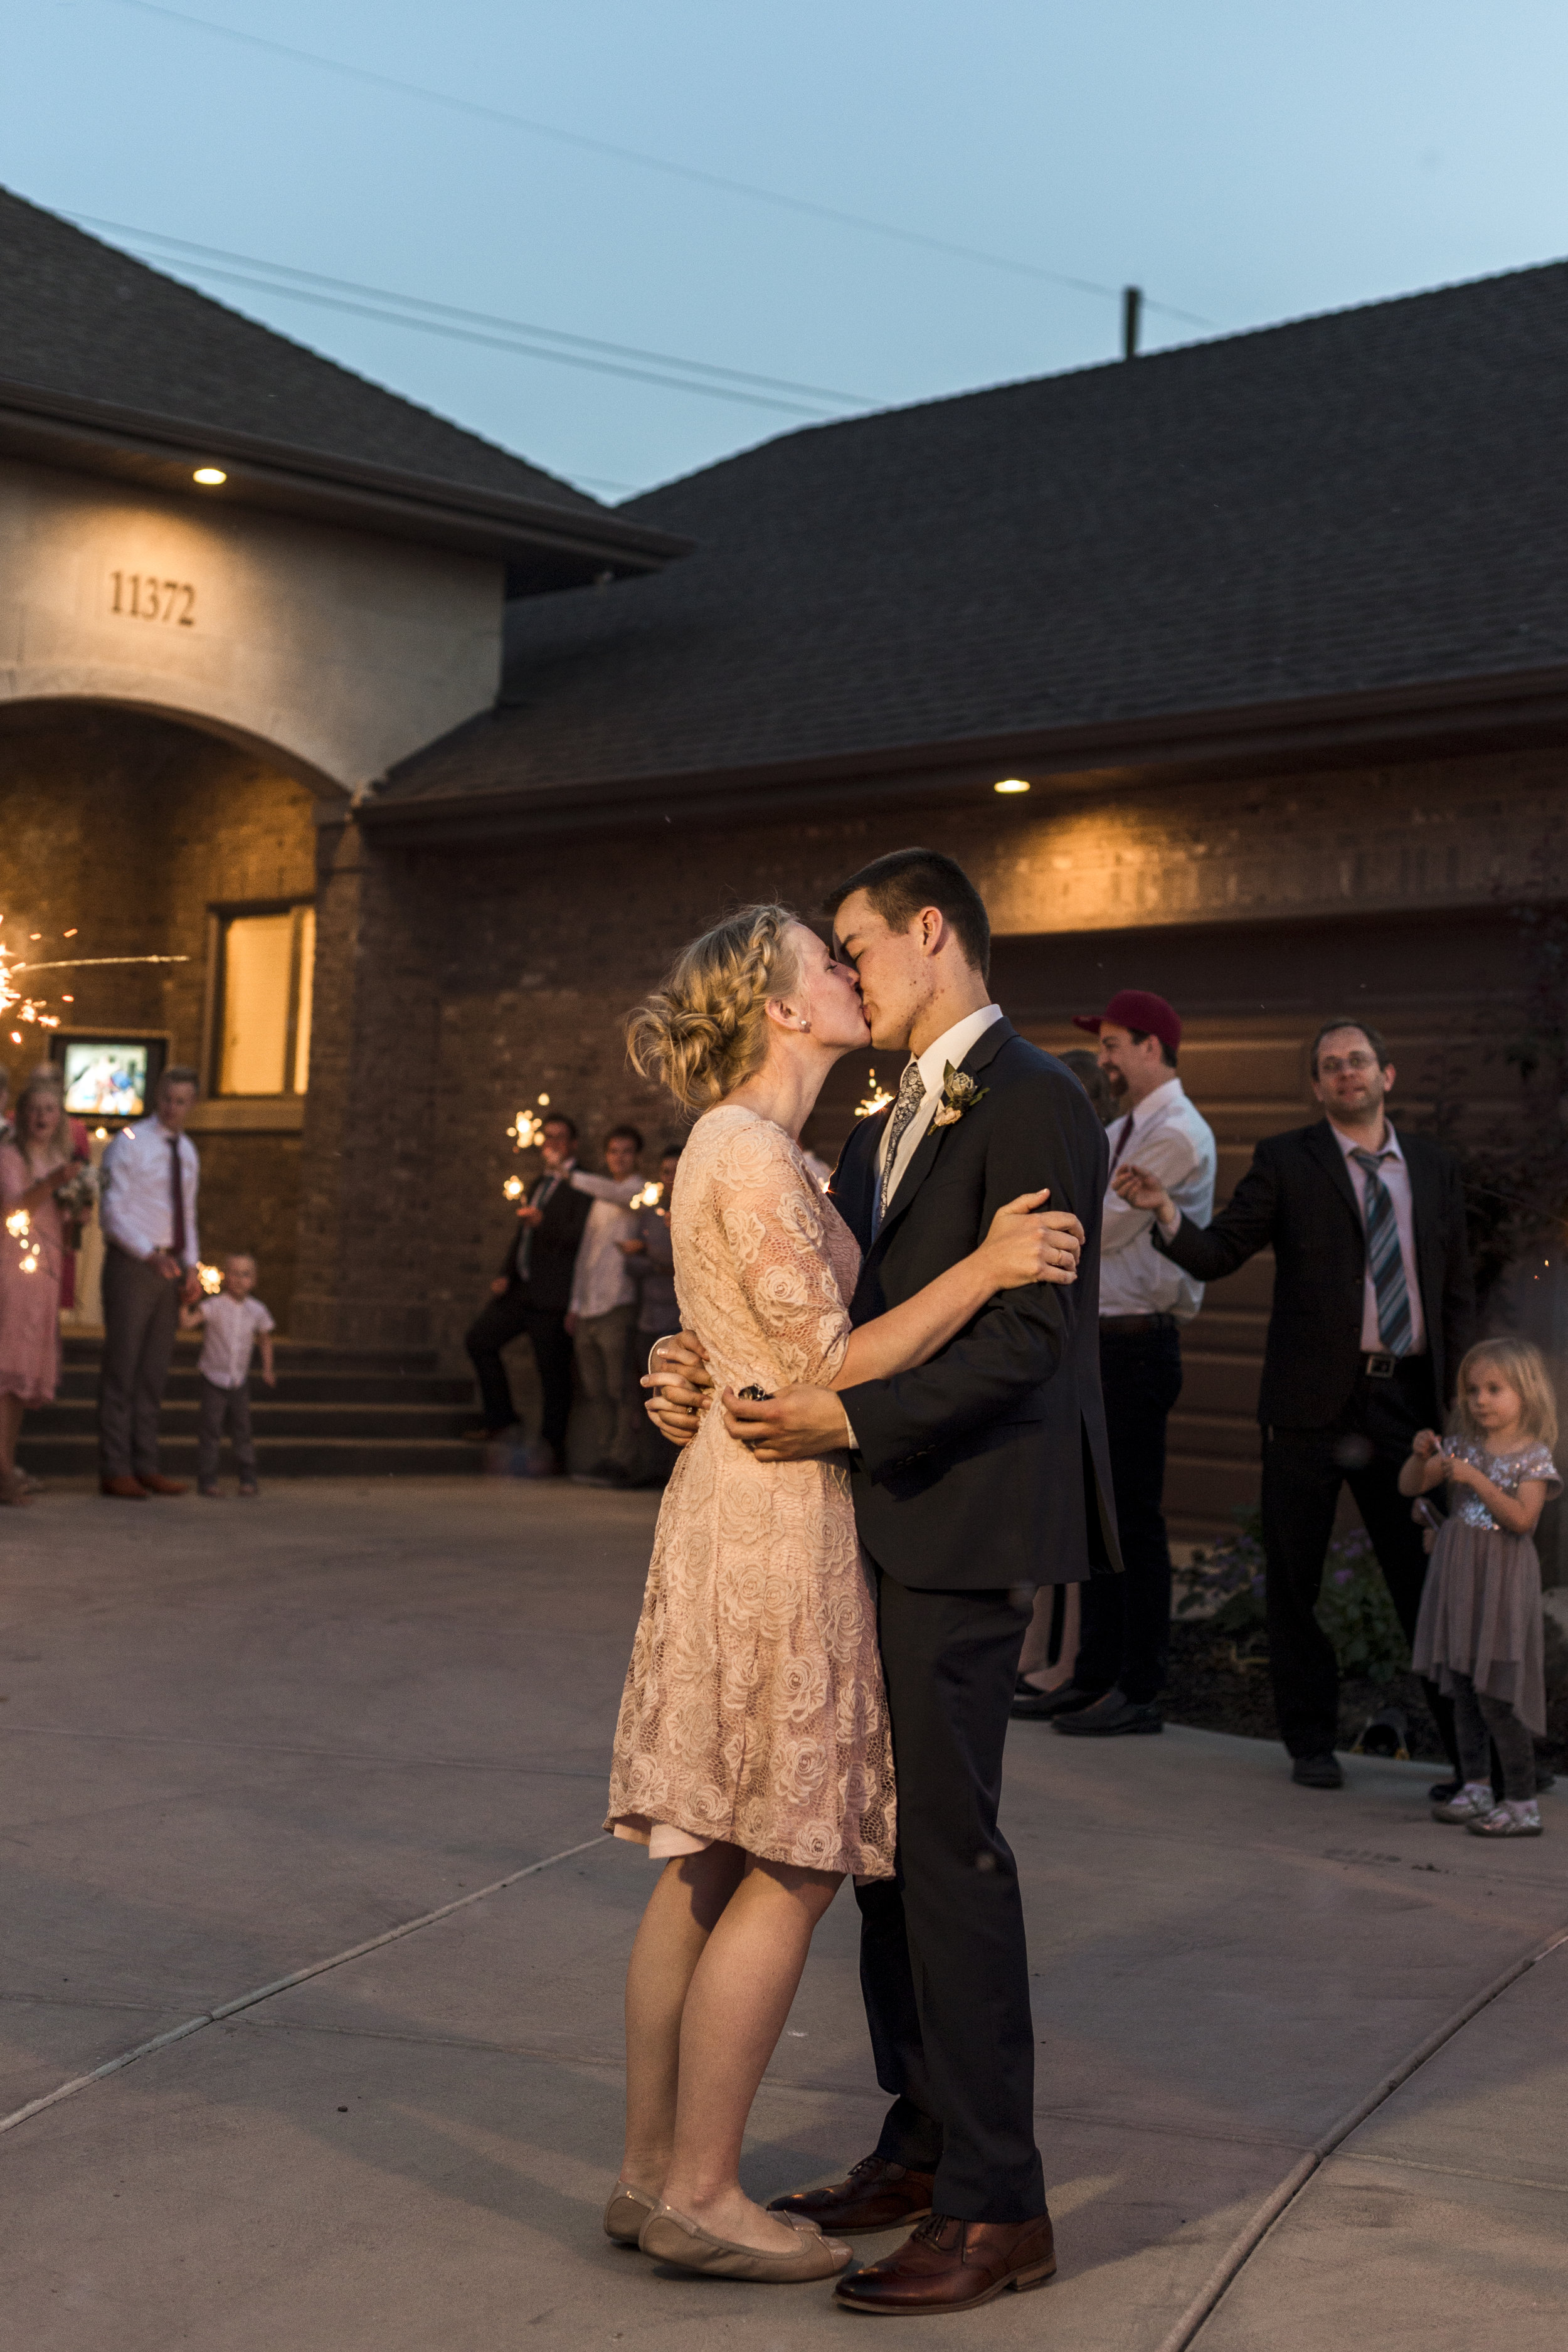 LDS Summer Wedding | South Jordan, Utah Wedding Photographer| Bri Bergman Photography 36.JPG